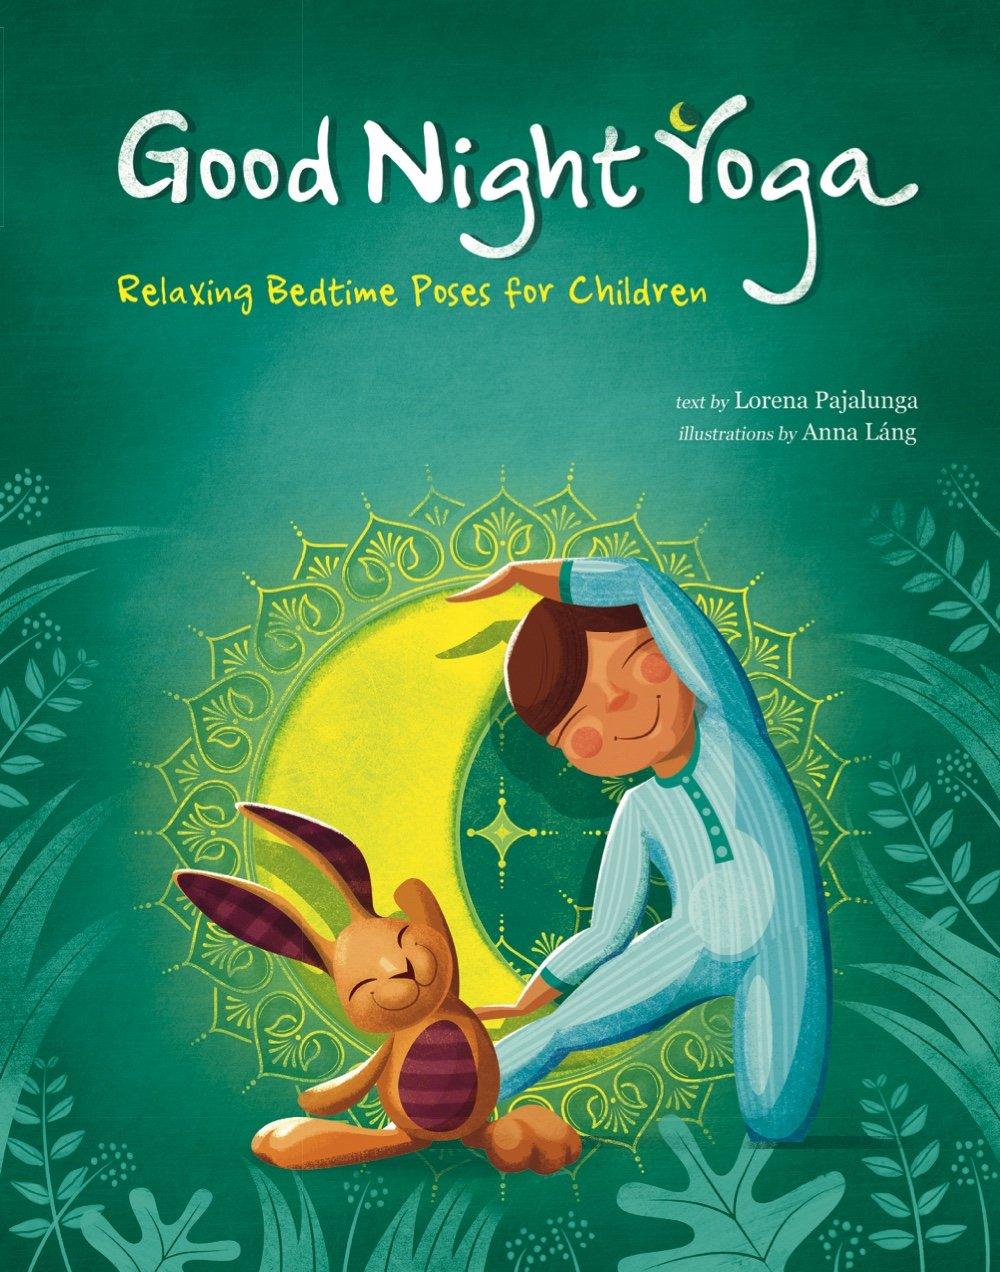 Amazon.com: Good Night Yoga: Relaxing Bedtime Poses for Children  (9788854412705): Lorena Valentina Pajalunga, Anna Lang: Books